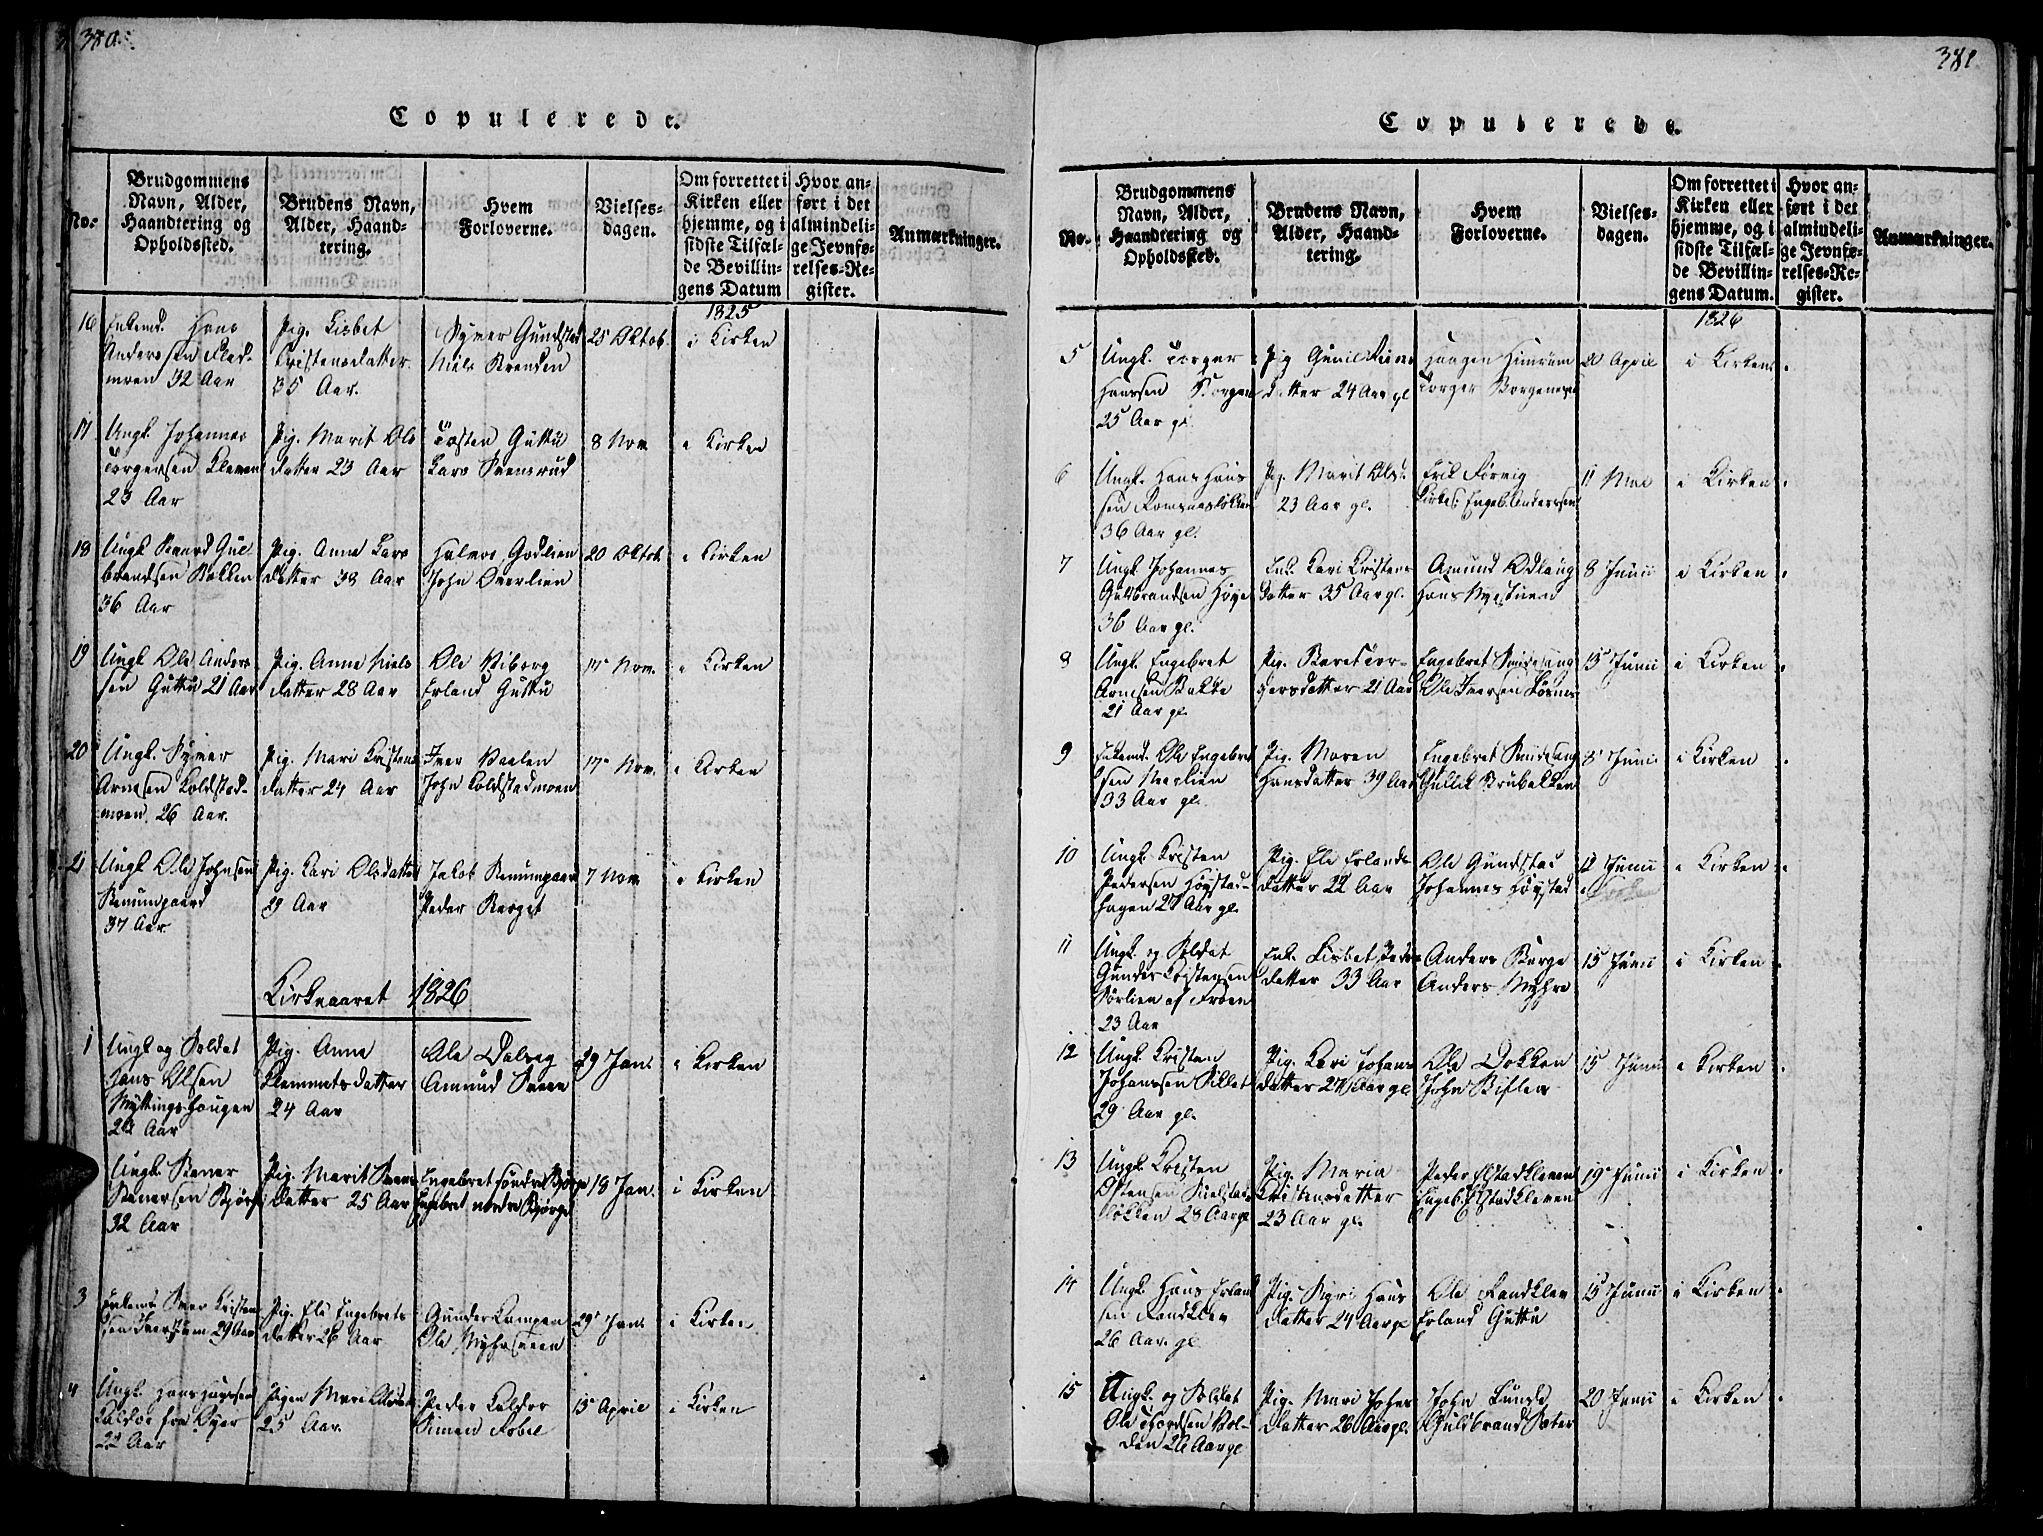 SAH, Ringebu prestekontor, Ministerialbok nr. 4, 1821-1839, s. 380-381